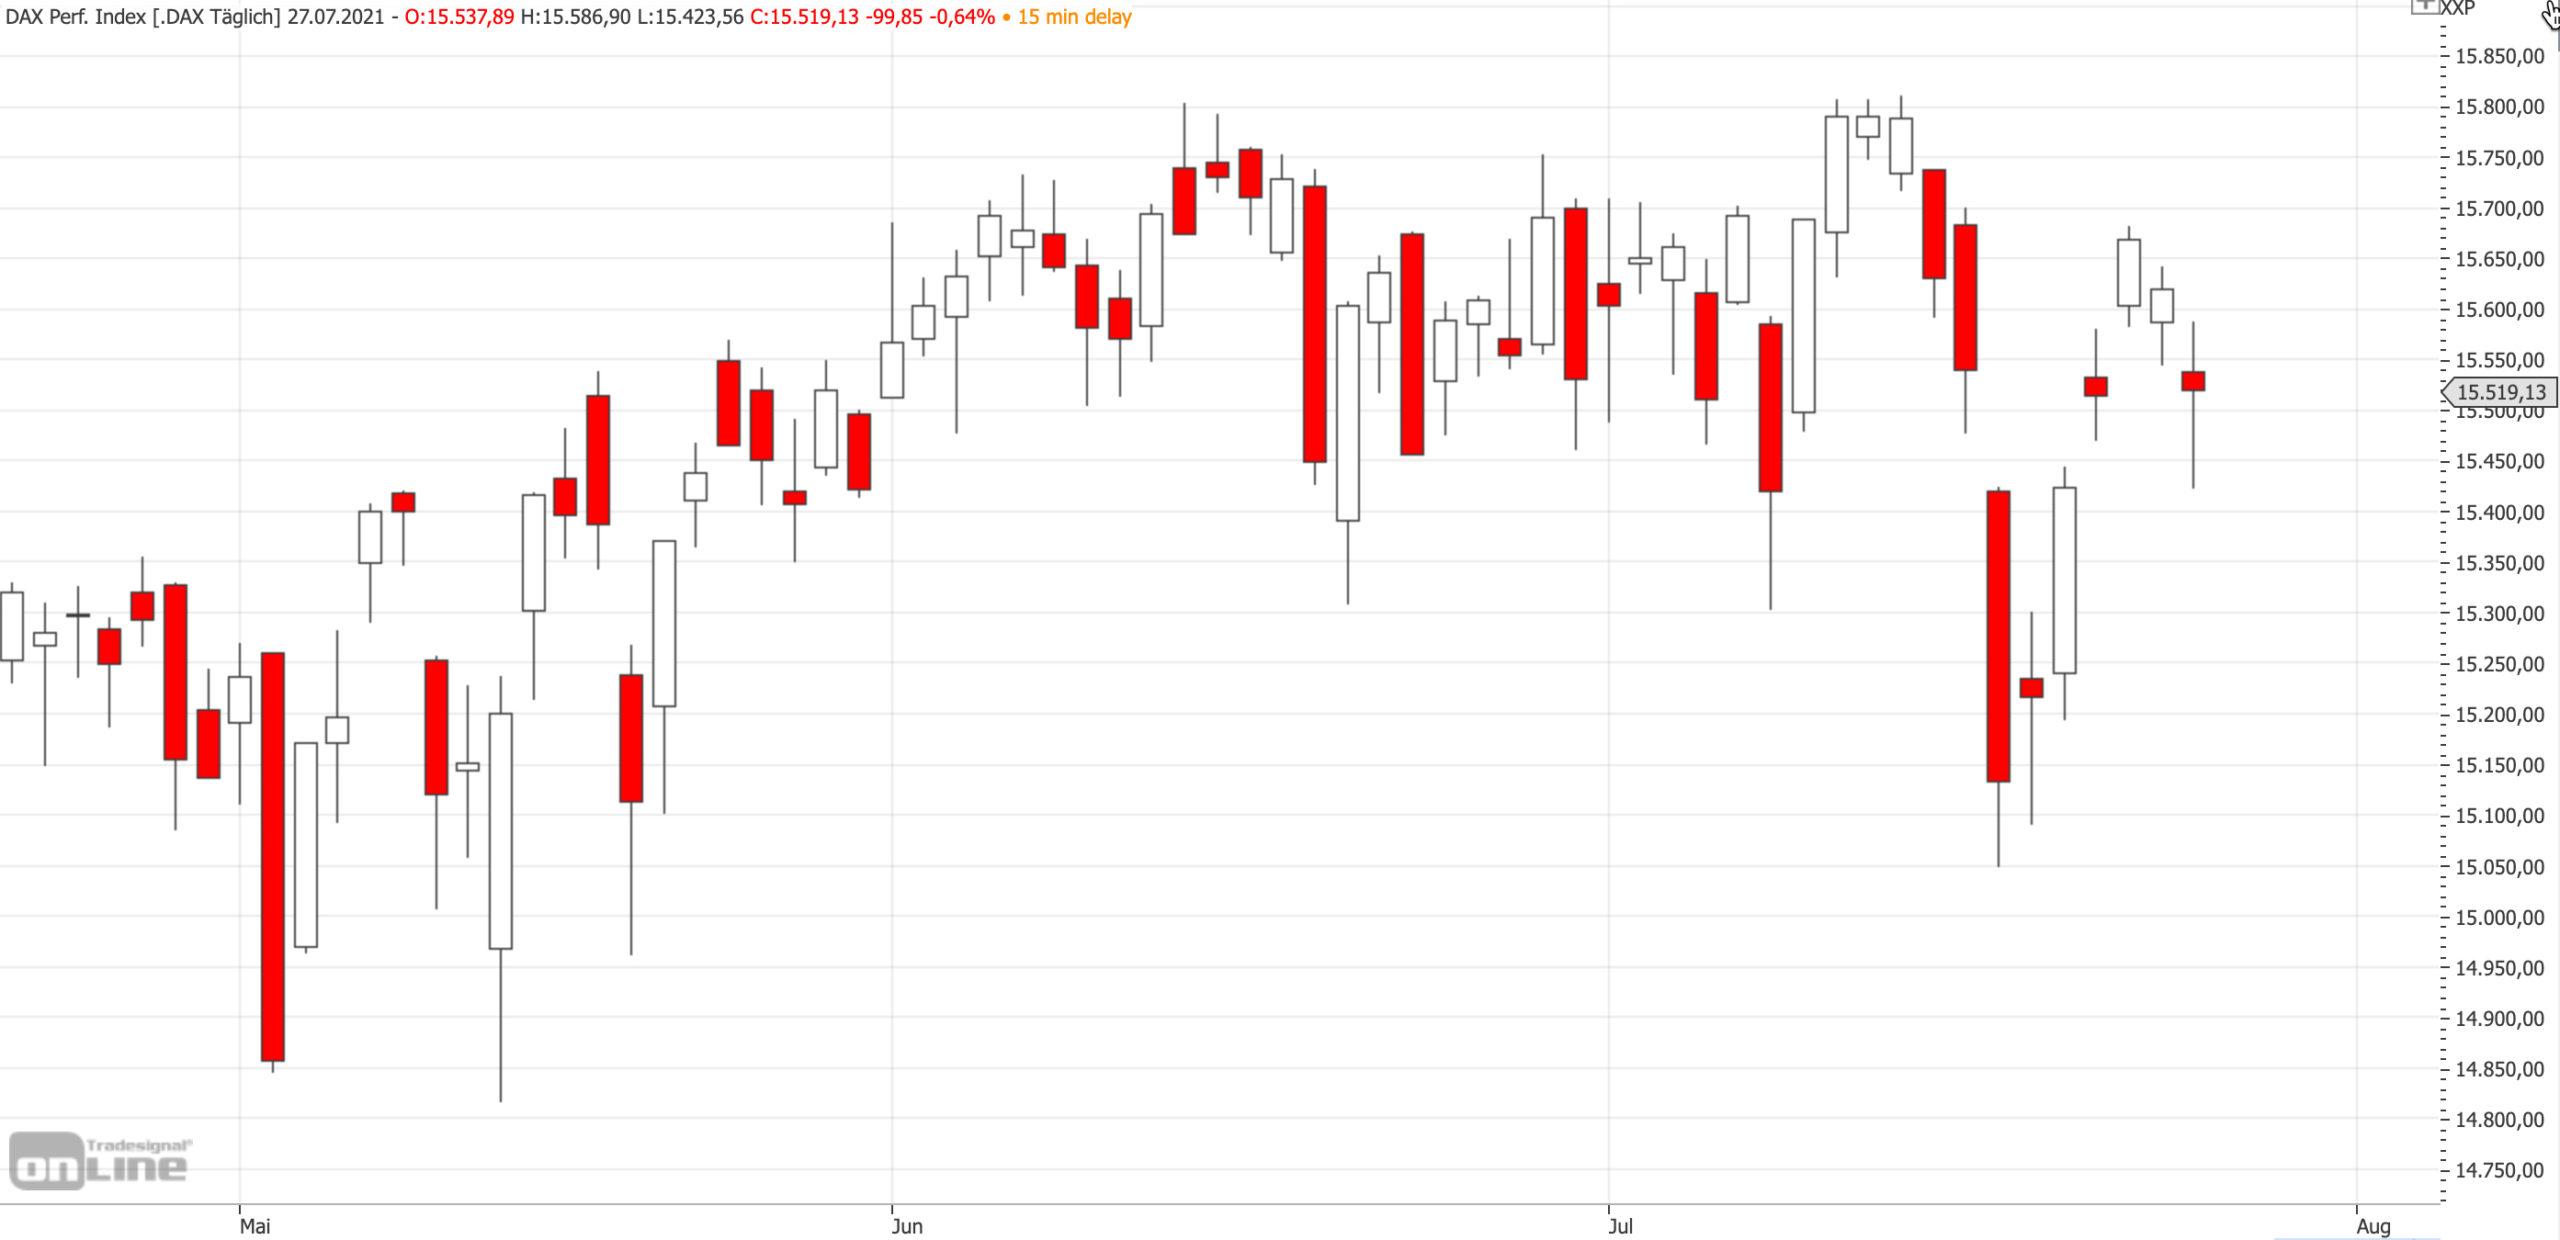 Mittelfristiger DAX-Chart am 27.07.2021